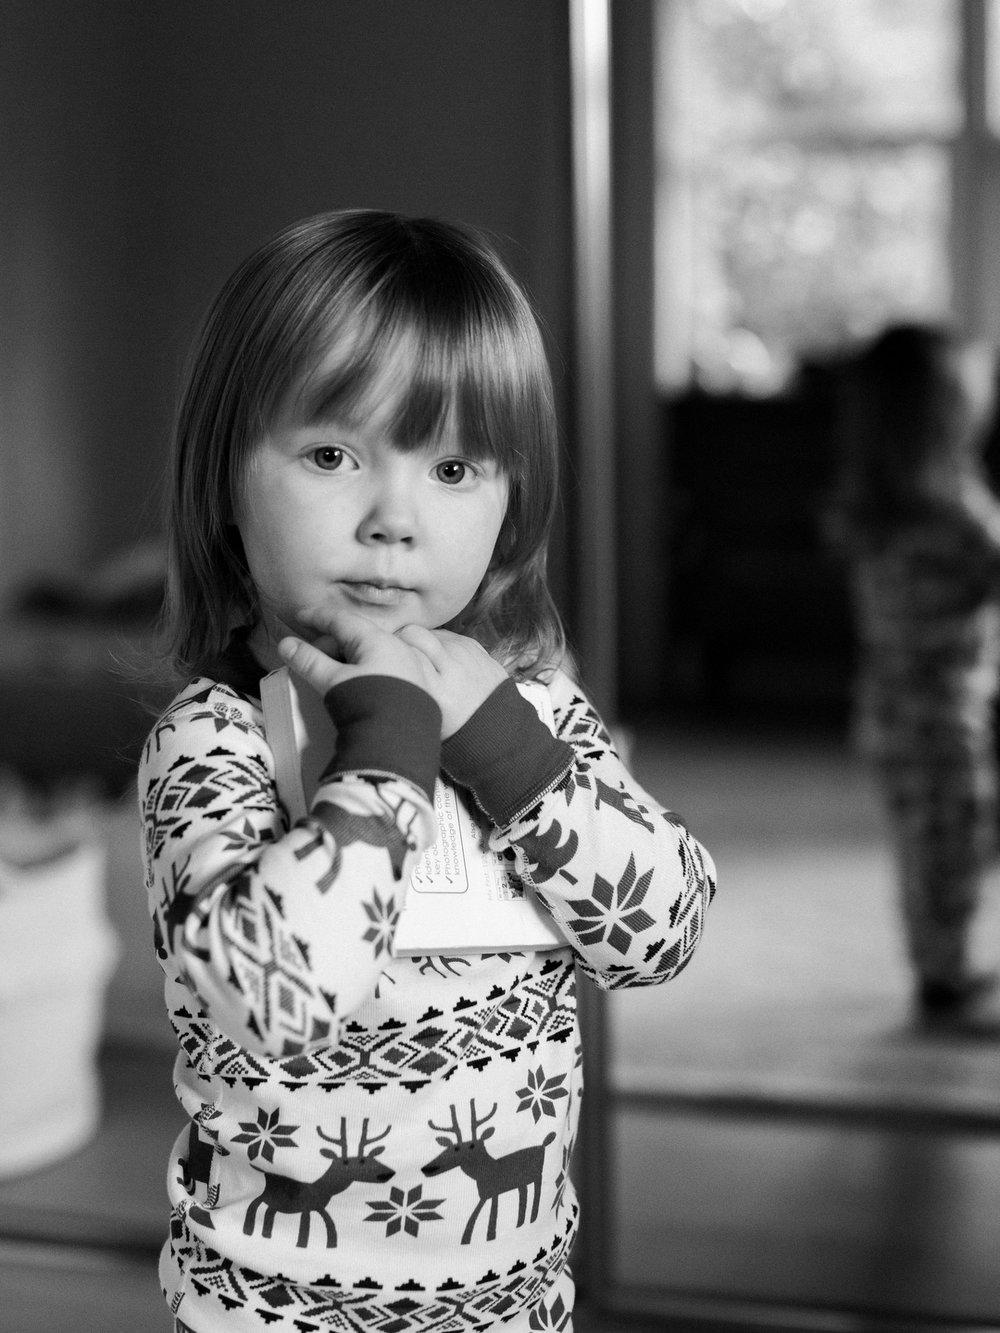 elisabeth_millay_childrens_photographer_017.jpg